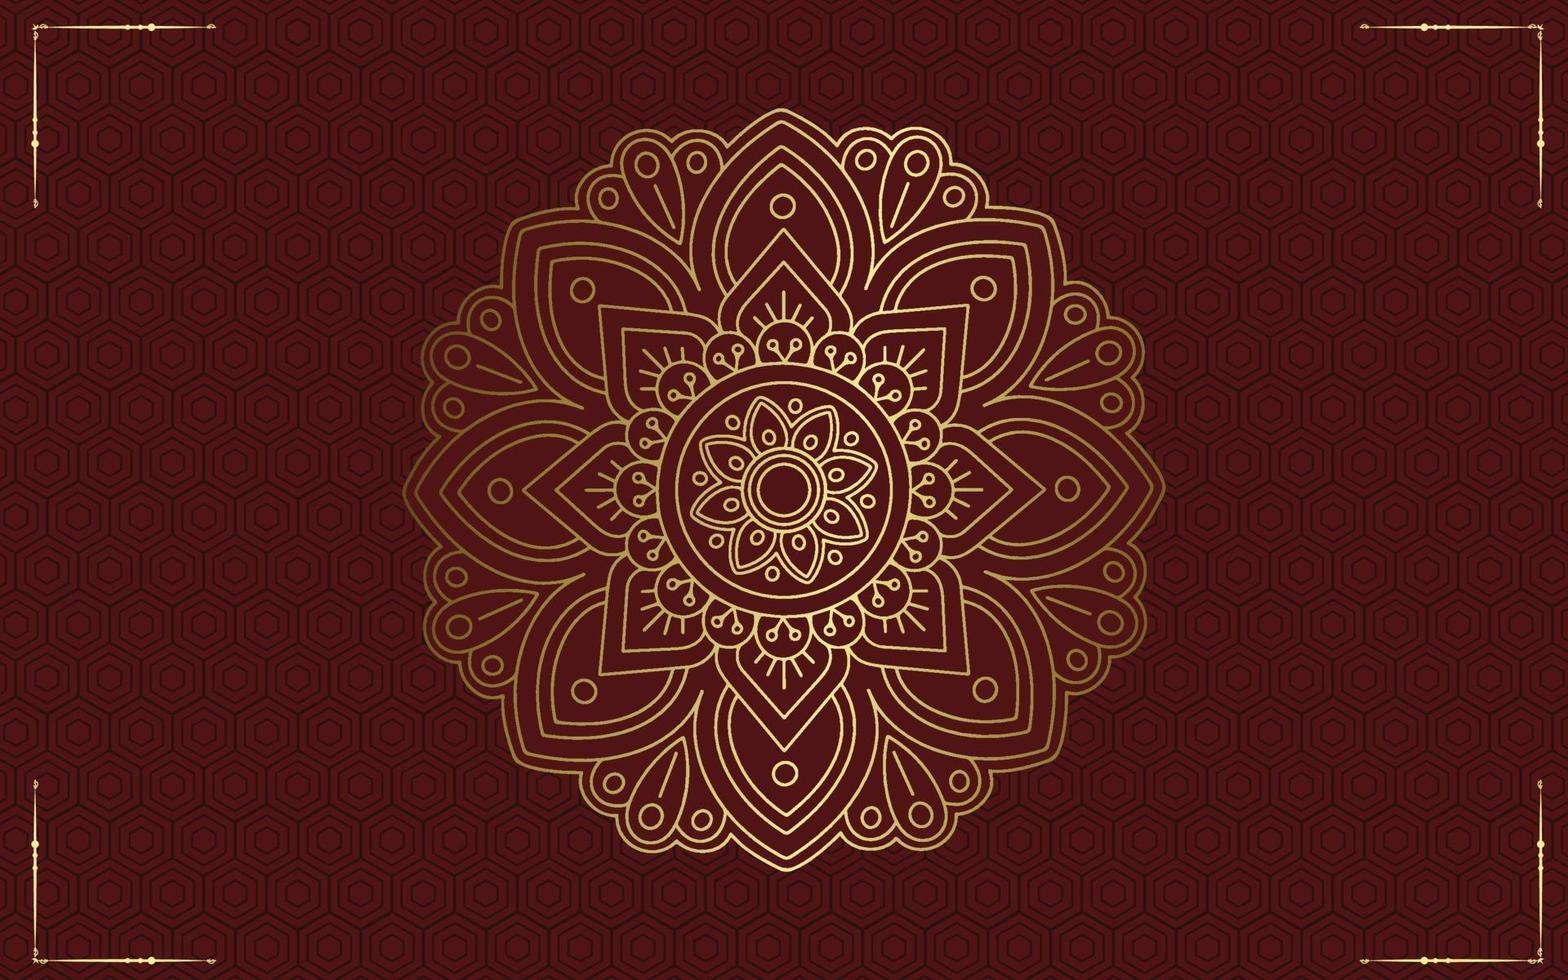 blommig och mandala dekorativ dekorativ ram bakgrund lyx premium vektor